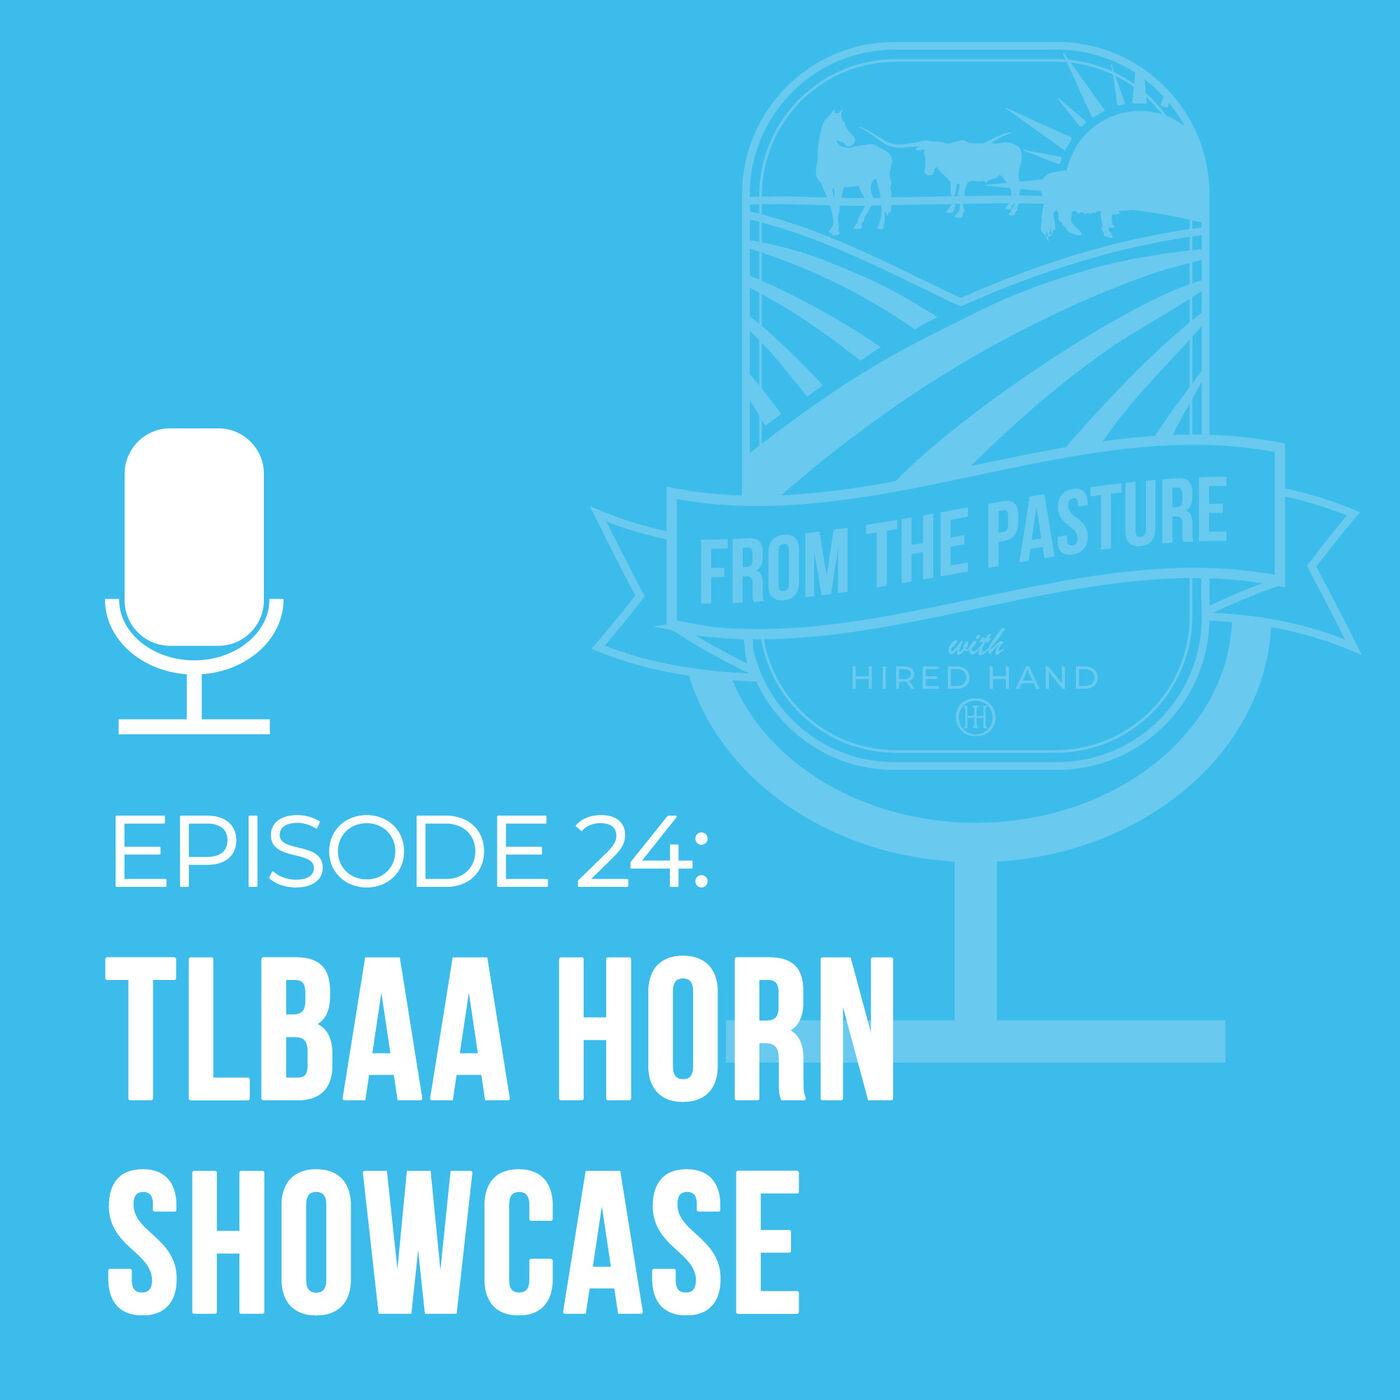 TLBAA Horn Showcase